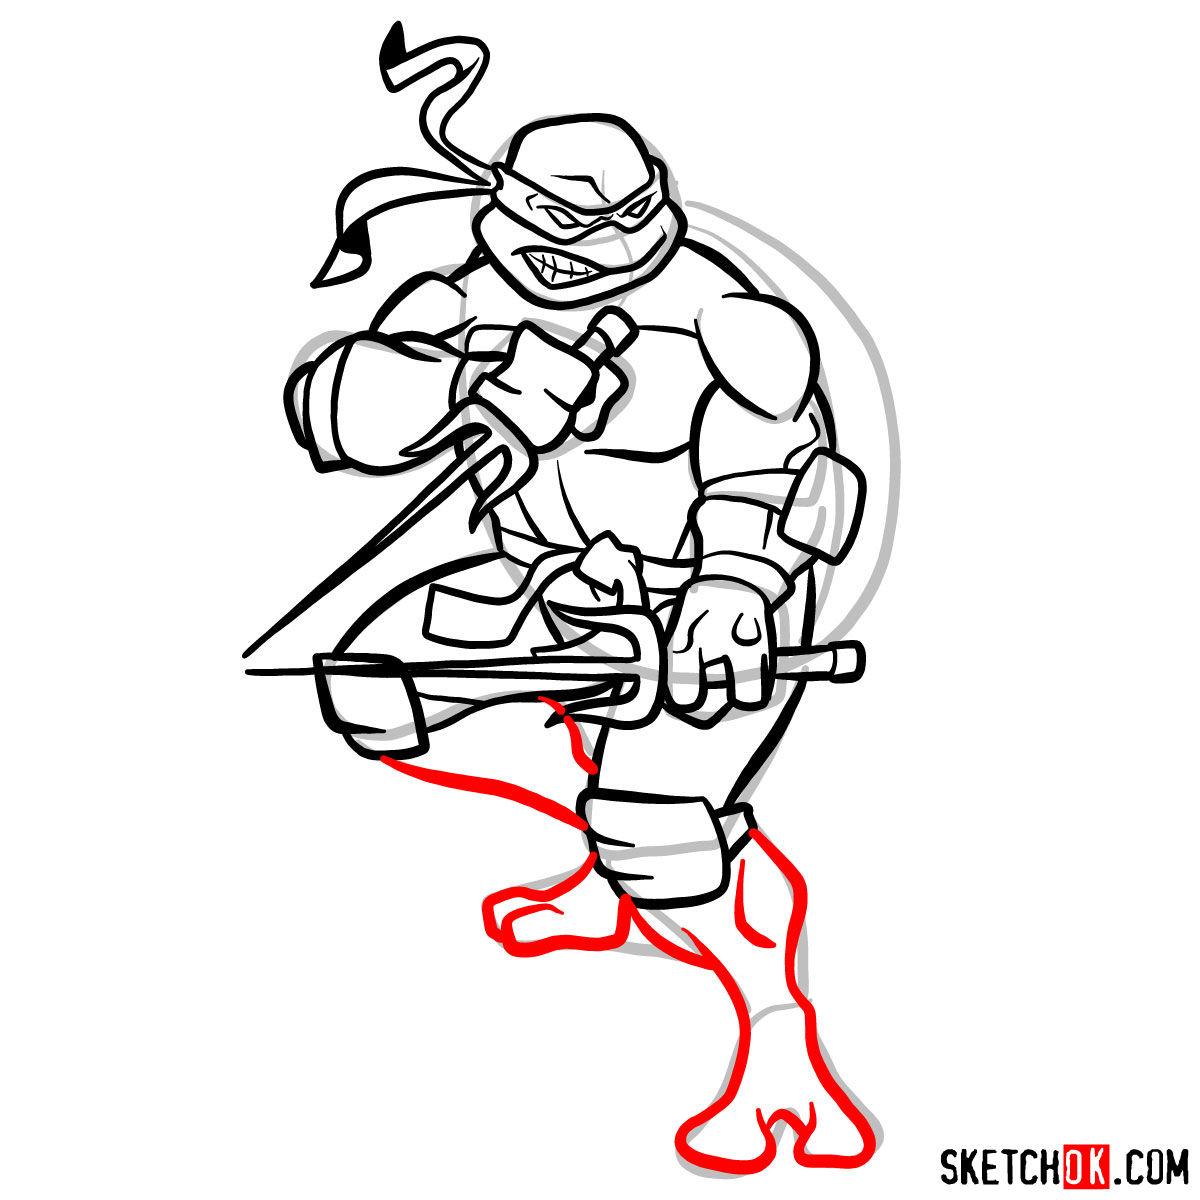 How to draw angry Raphael teenage mutant ninja turtle - step 12